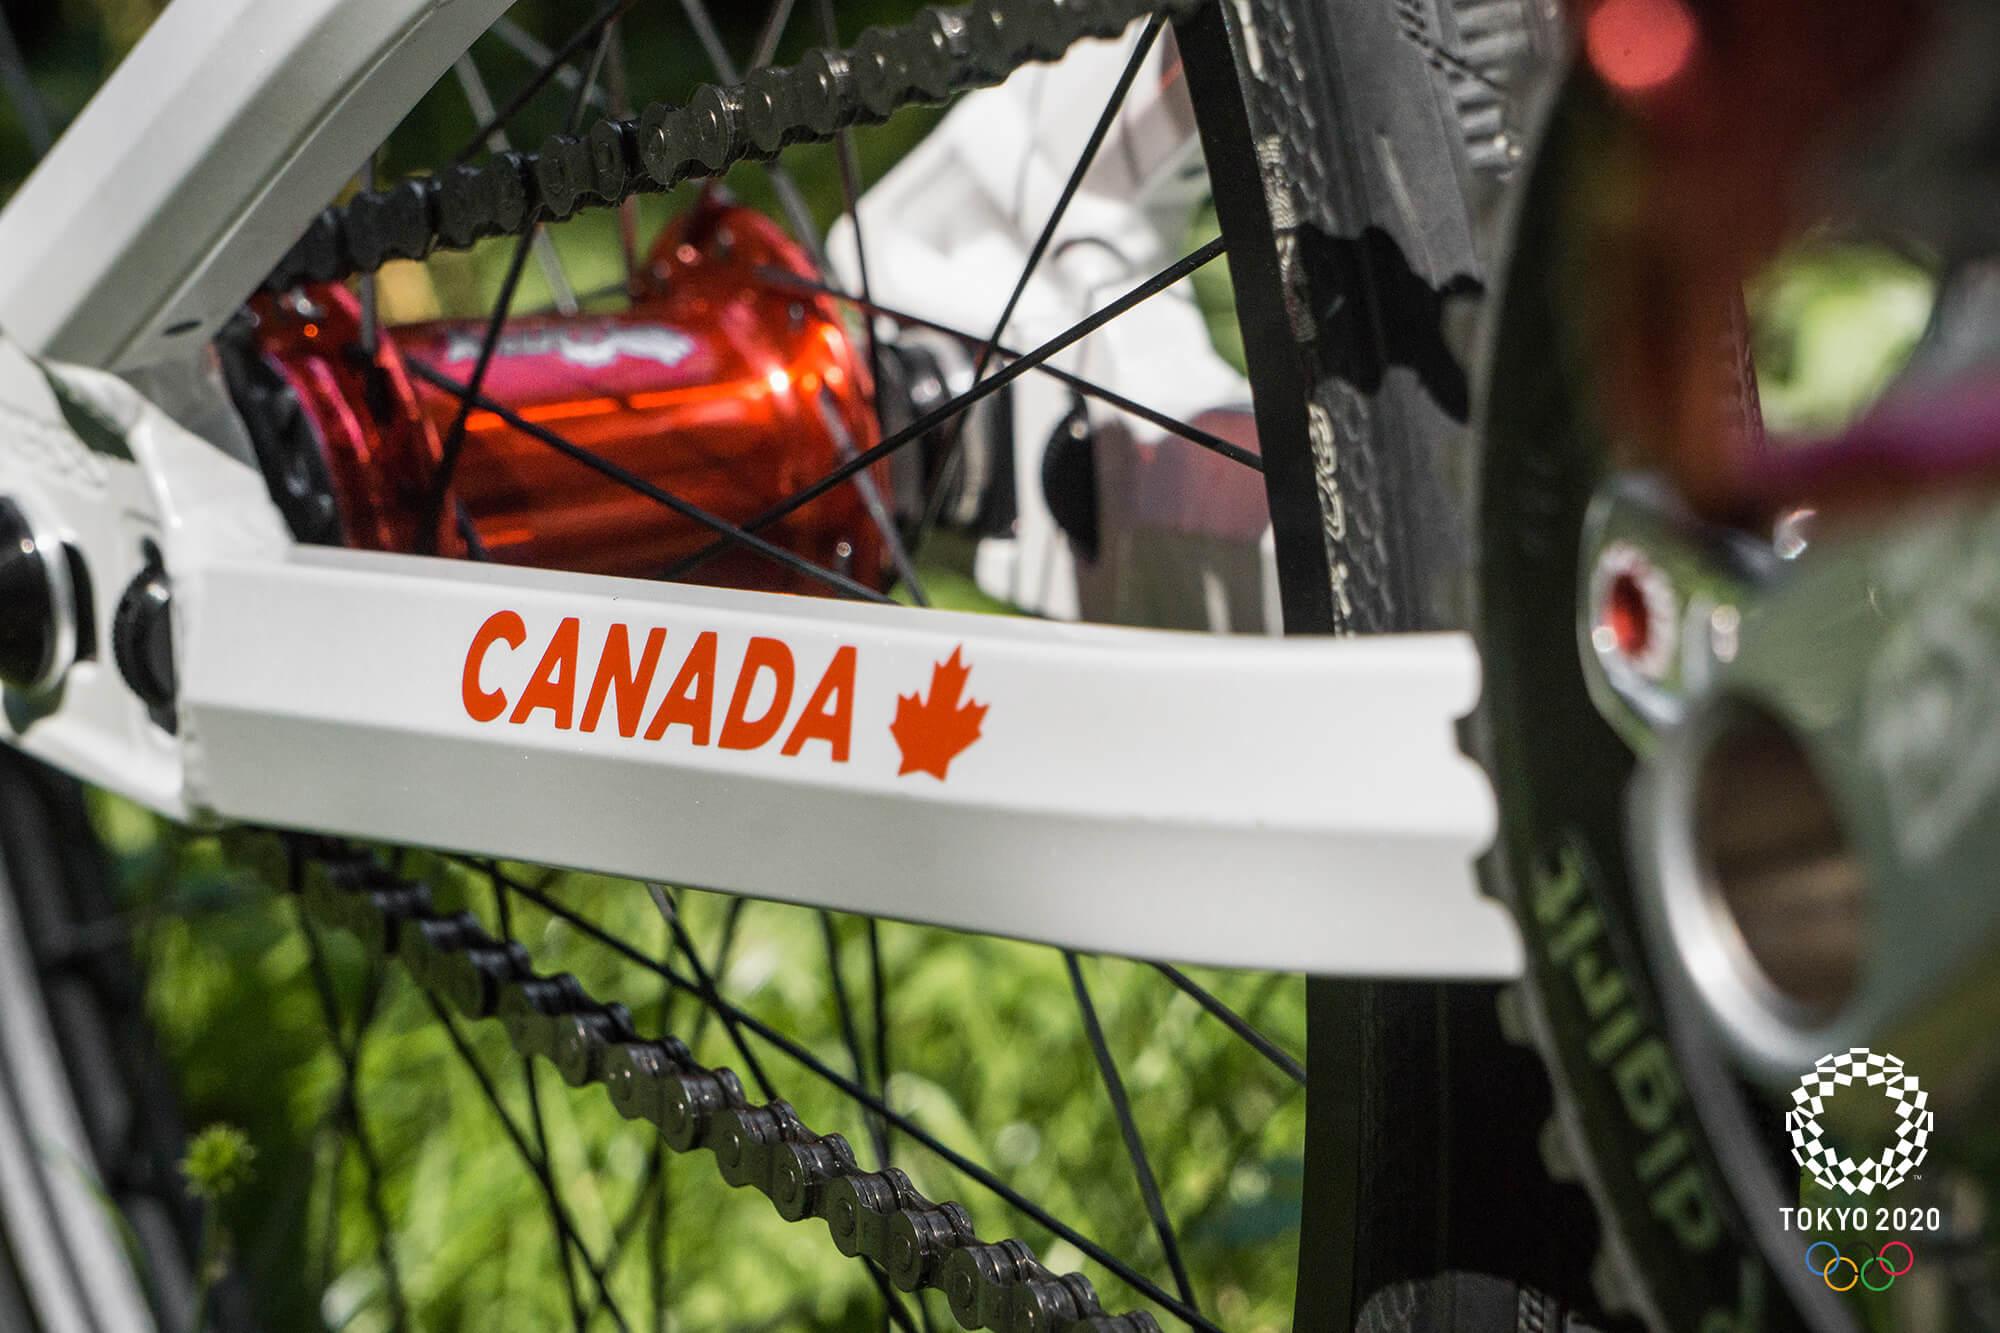 Drew Mechielsen Tokyo Olympic Bike Check 3 - Niels Bensink